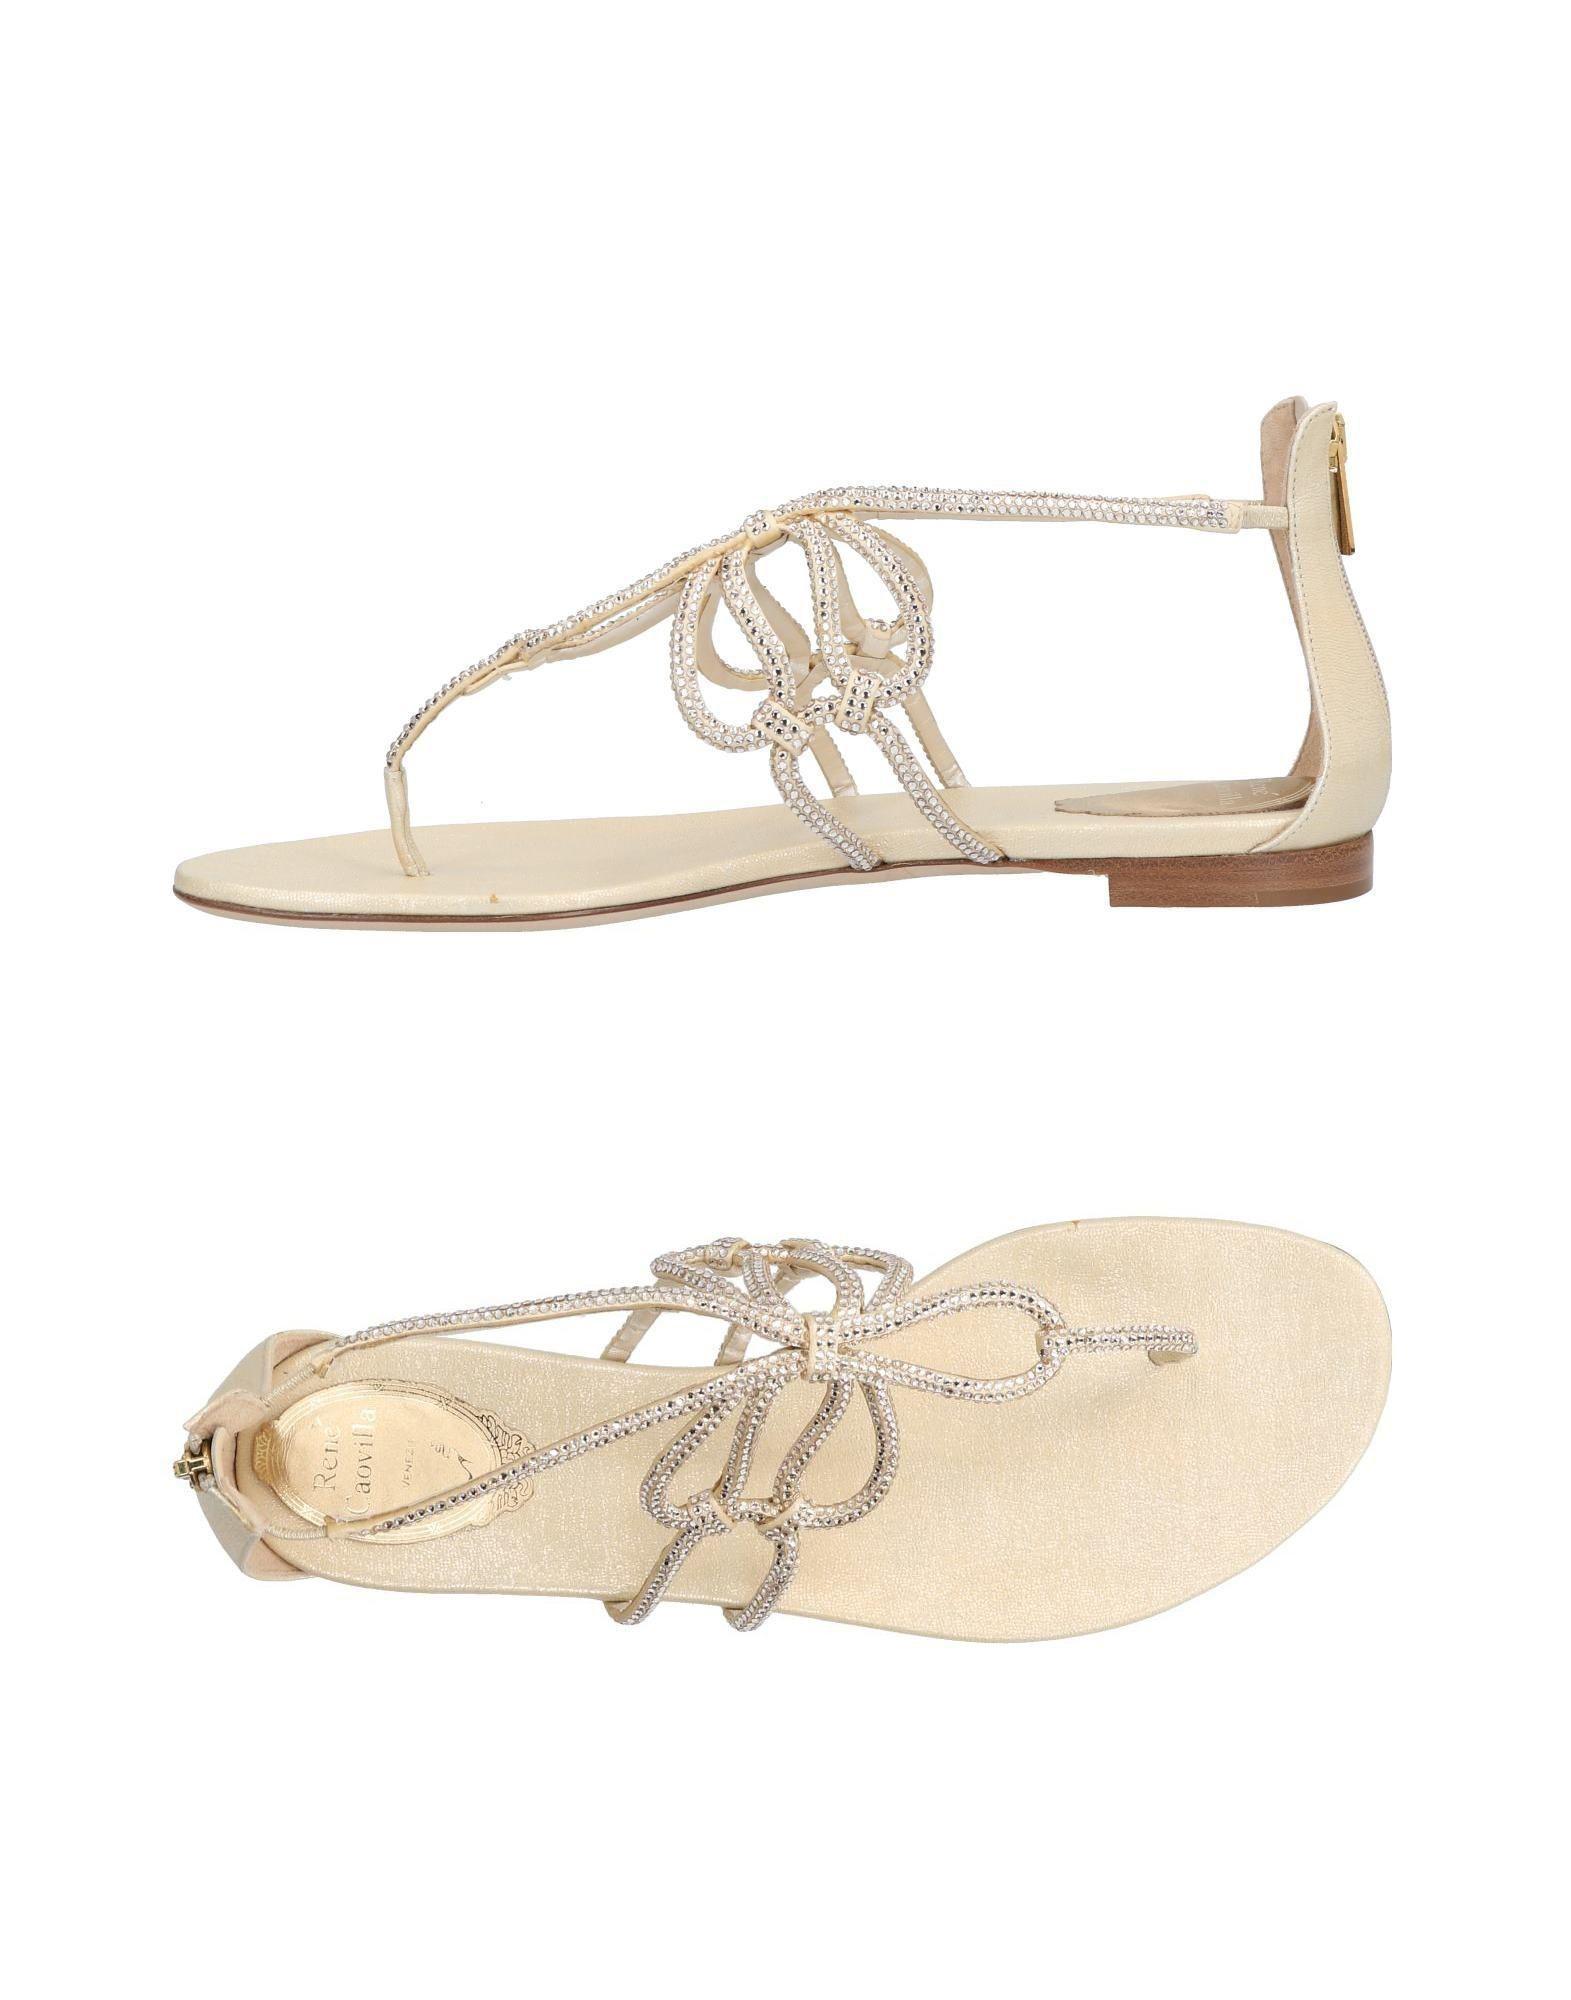 Chaussures - Sandales Post Orteils Rene De Caovilla dkN3YyAb